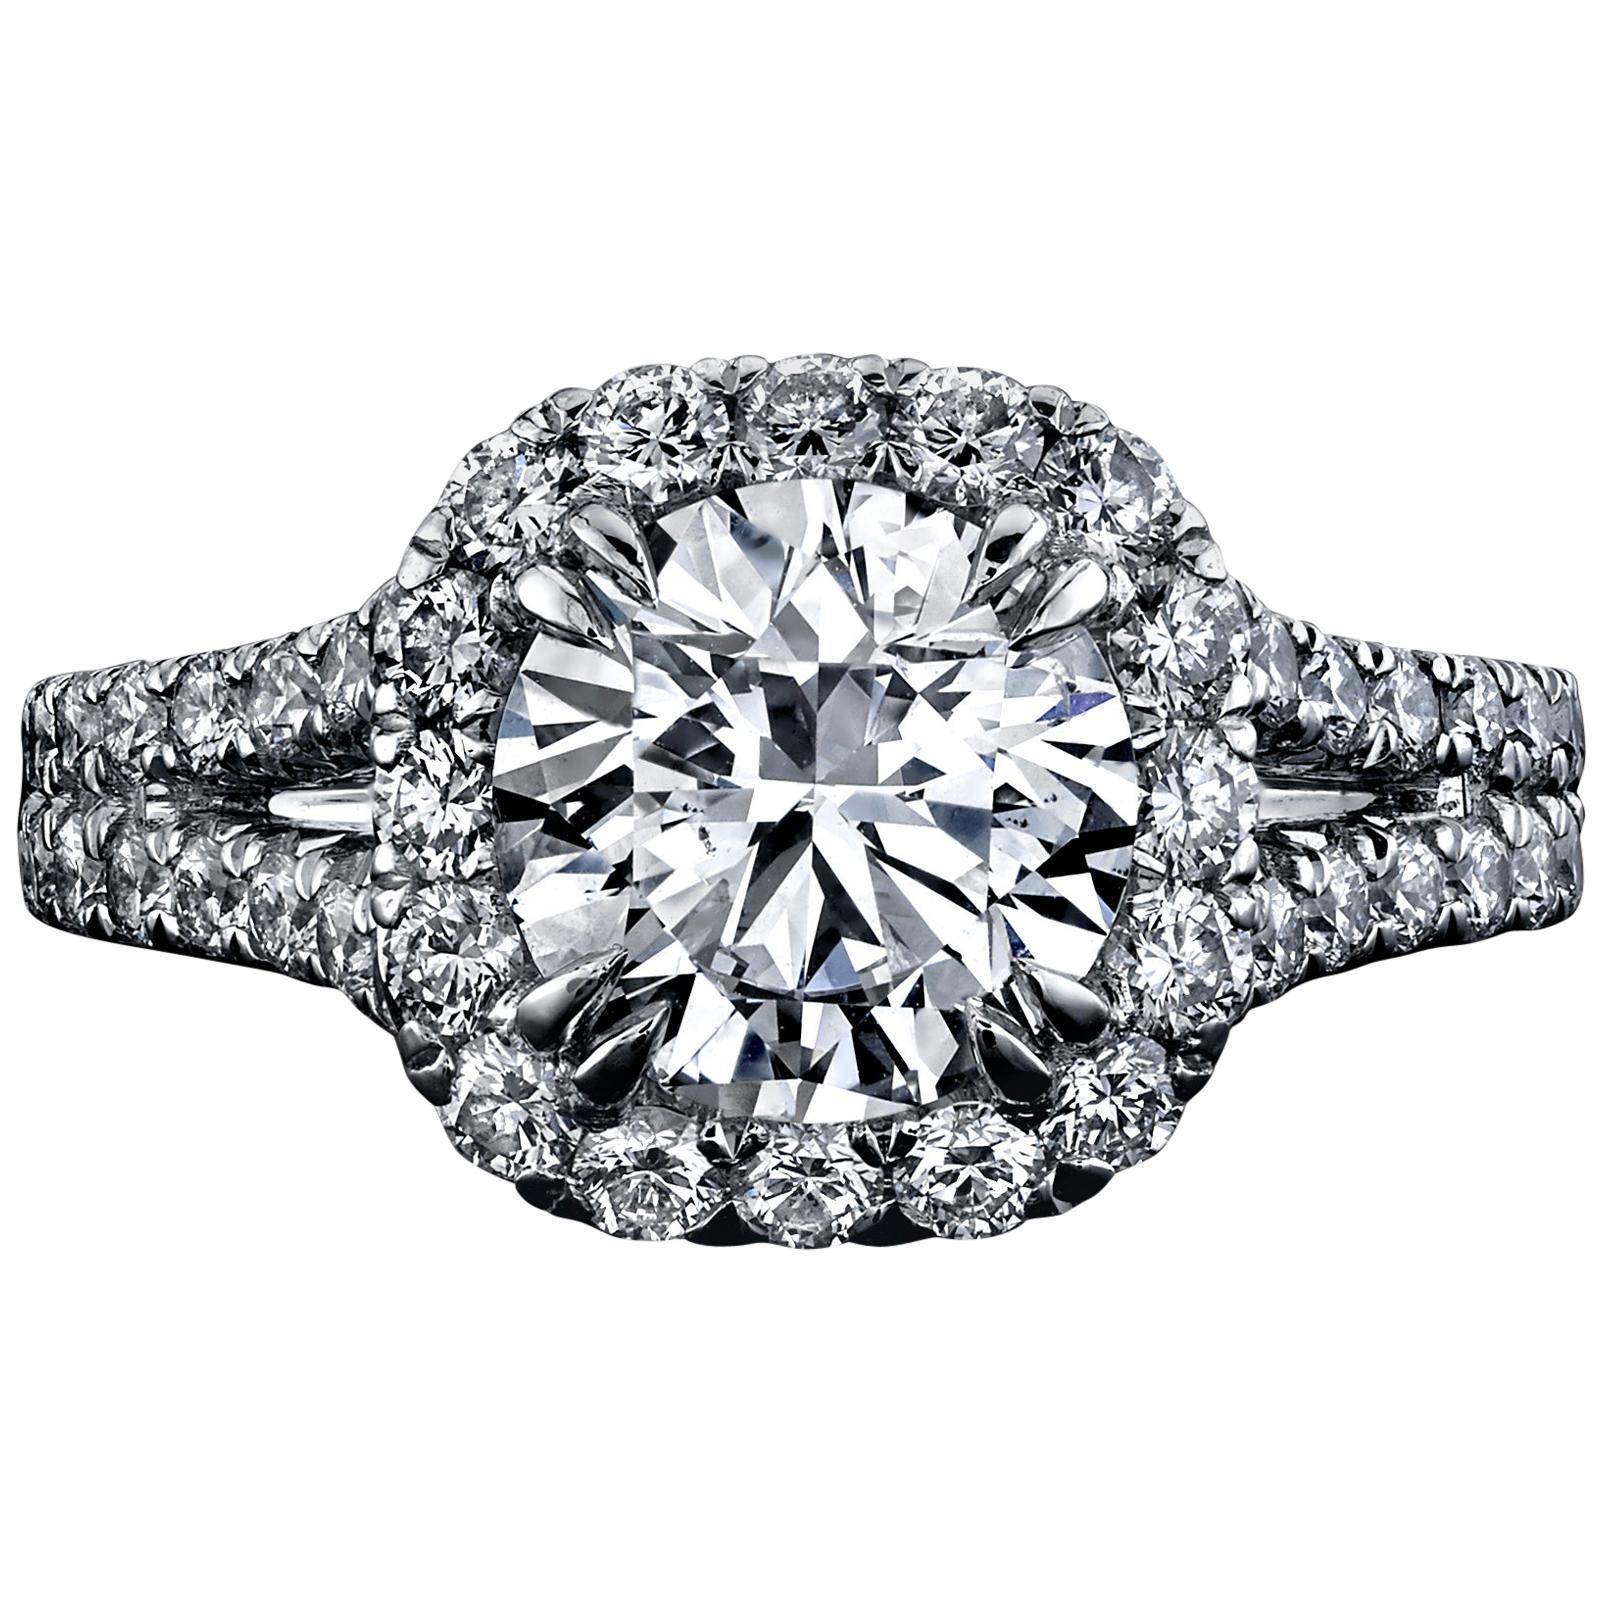 GIA Certified 2.01 Carat Round Brilliant Diamond Ring